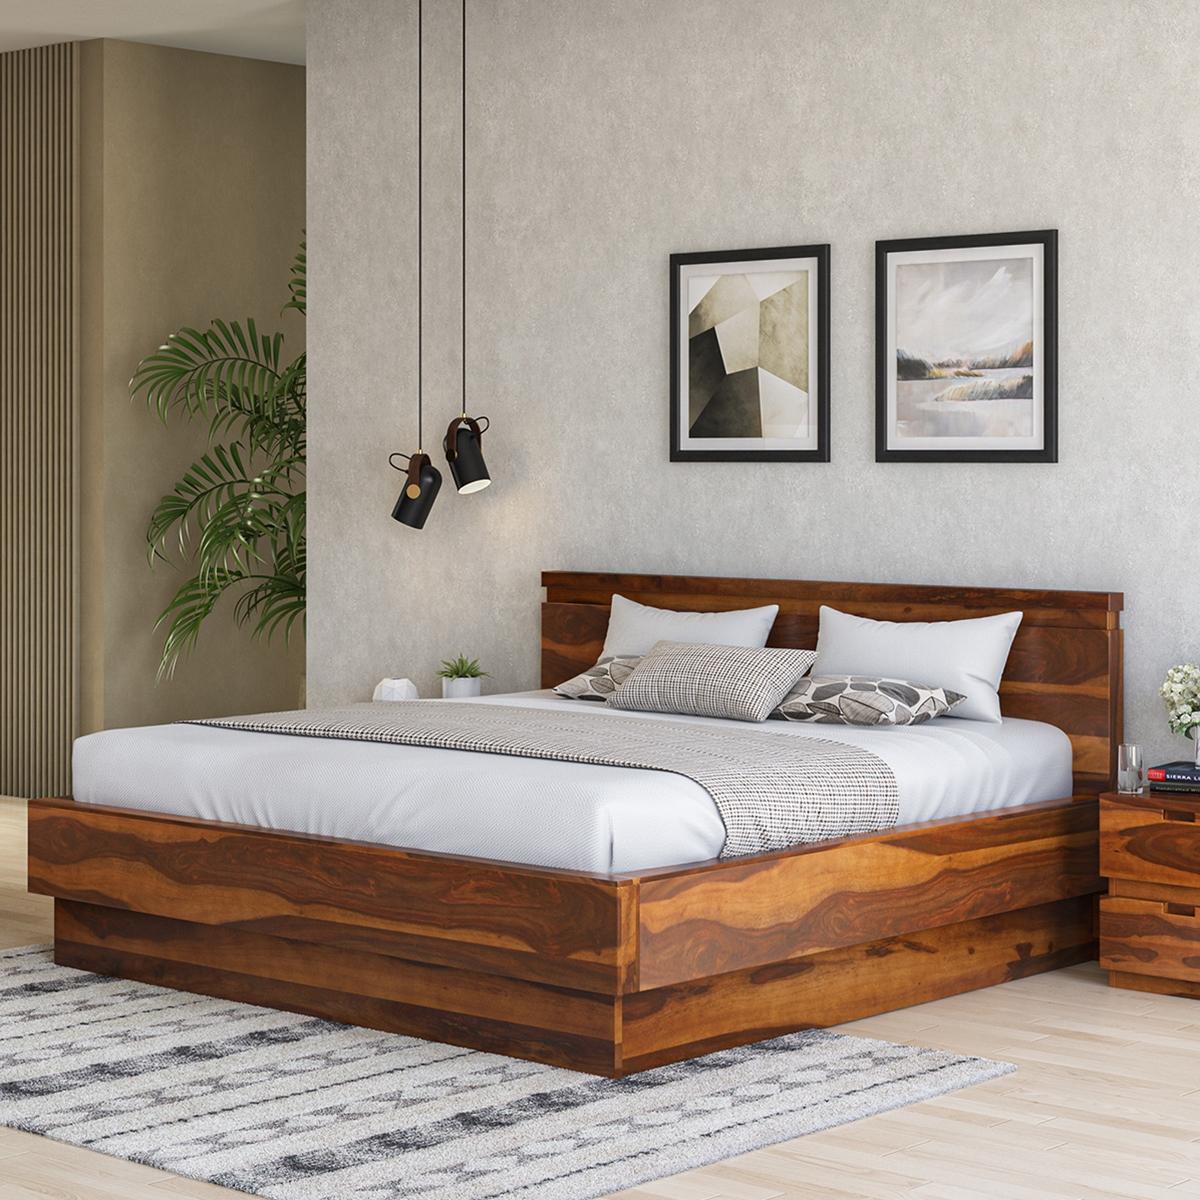 Picture of: Modern Simplicity Solid Wood Platform Bed Frame